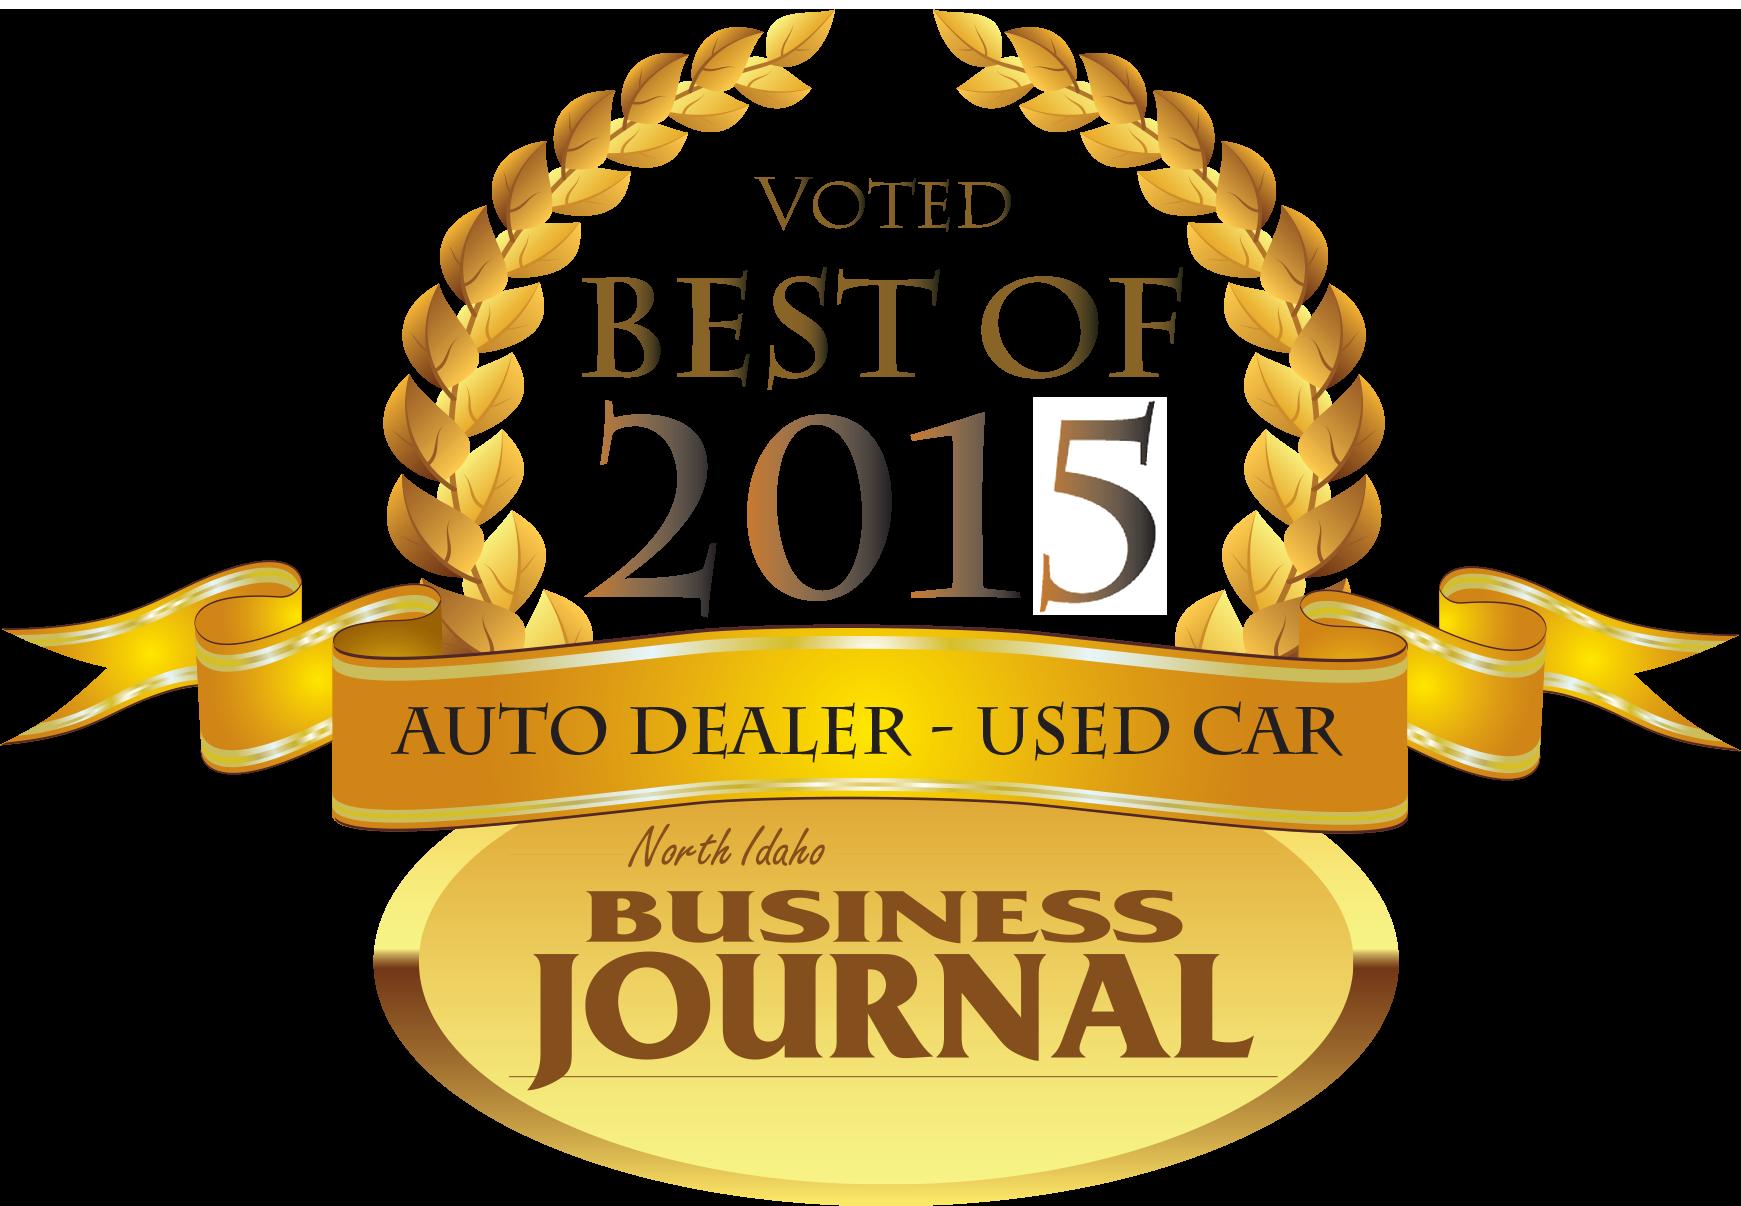 findlay chrysler jeep dodge ram awarded best auto dealership in north idaho parker toyota and. Black Bedroom Furniture Sets. Home Design Ideas